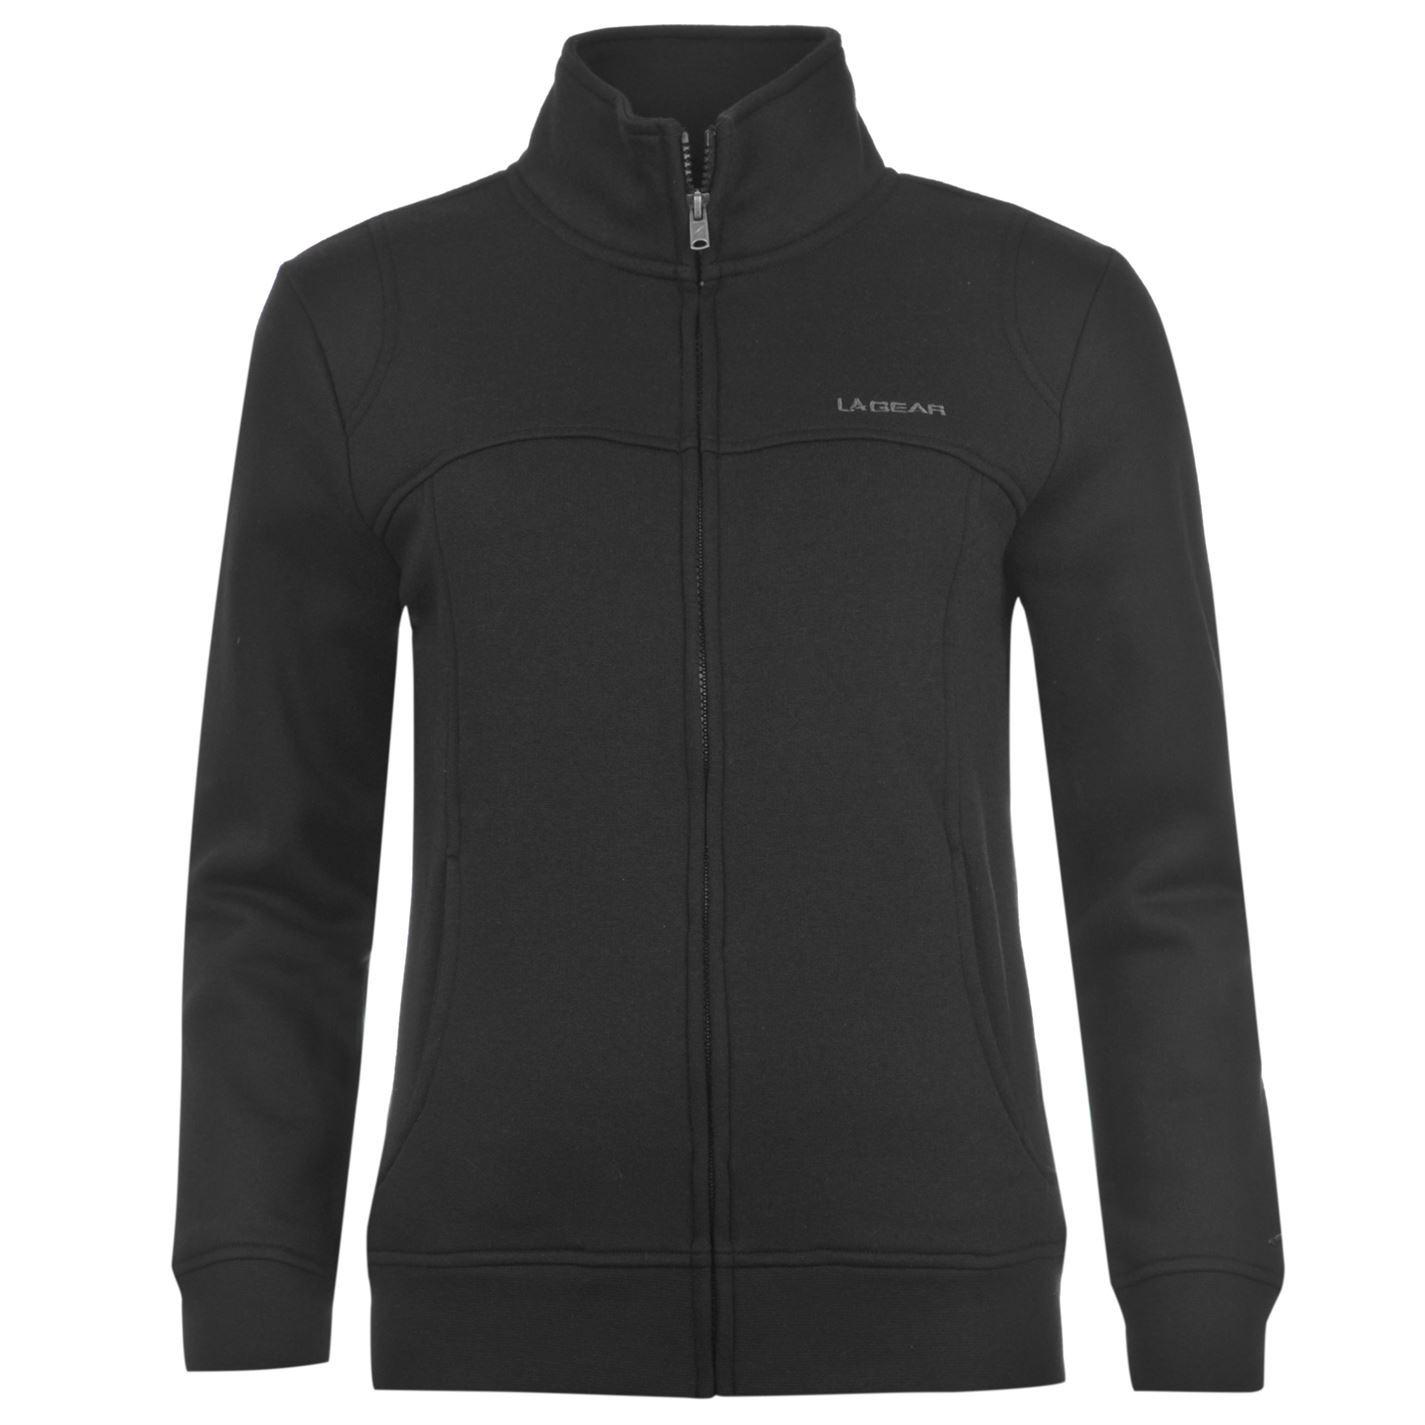 la gear full zip fleece track jacket womens black tracksuit top. Black Bedroom Furniture Sets. Home Design Ideas